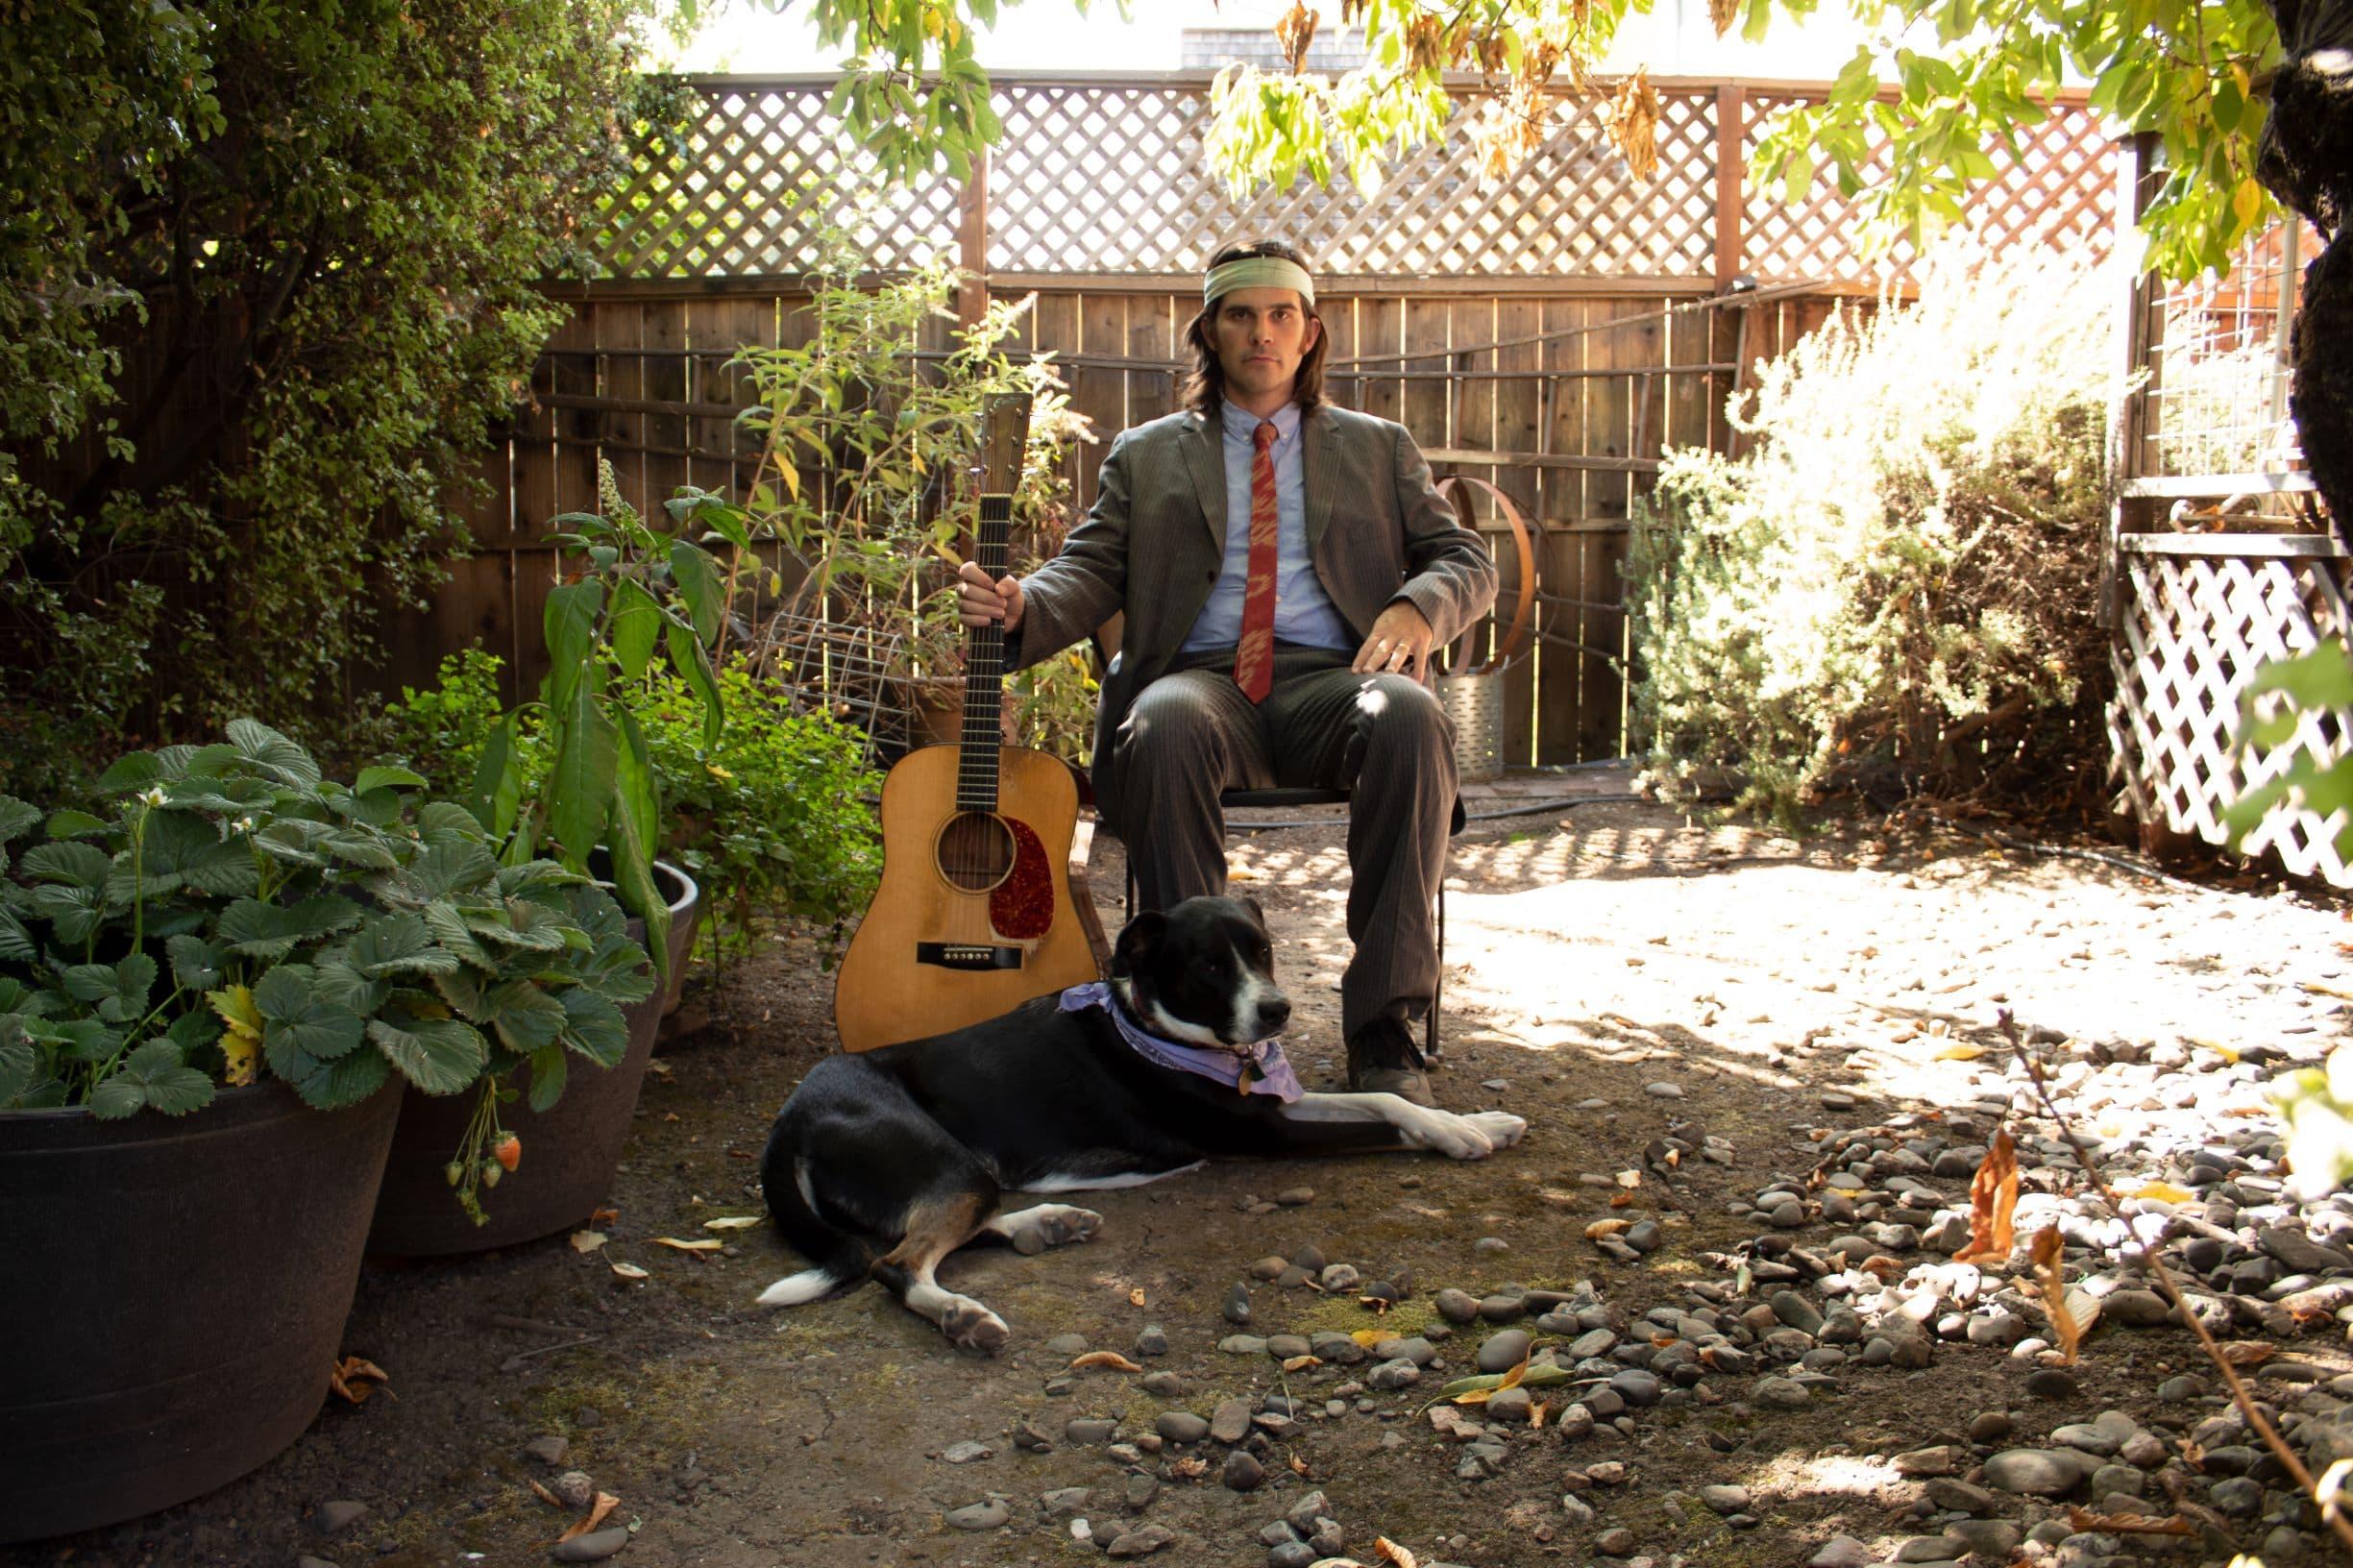 Singer and guitarist Stash Wyslouch. (Courtesy Mariel Vandersteel)